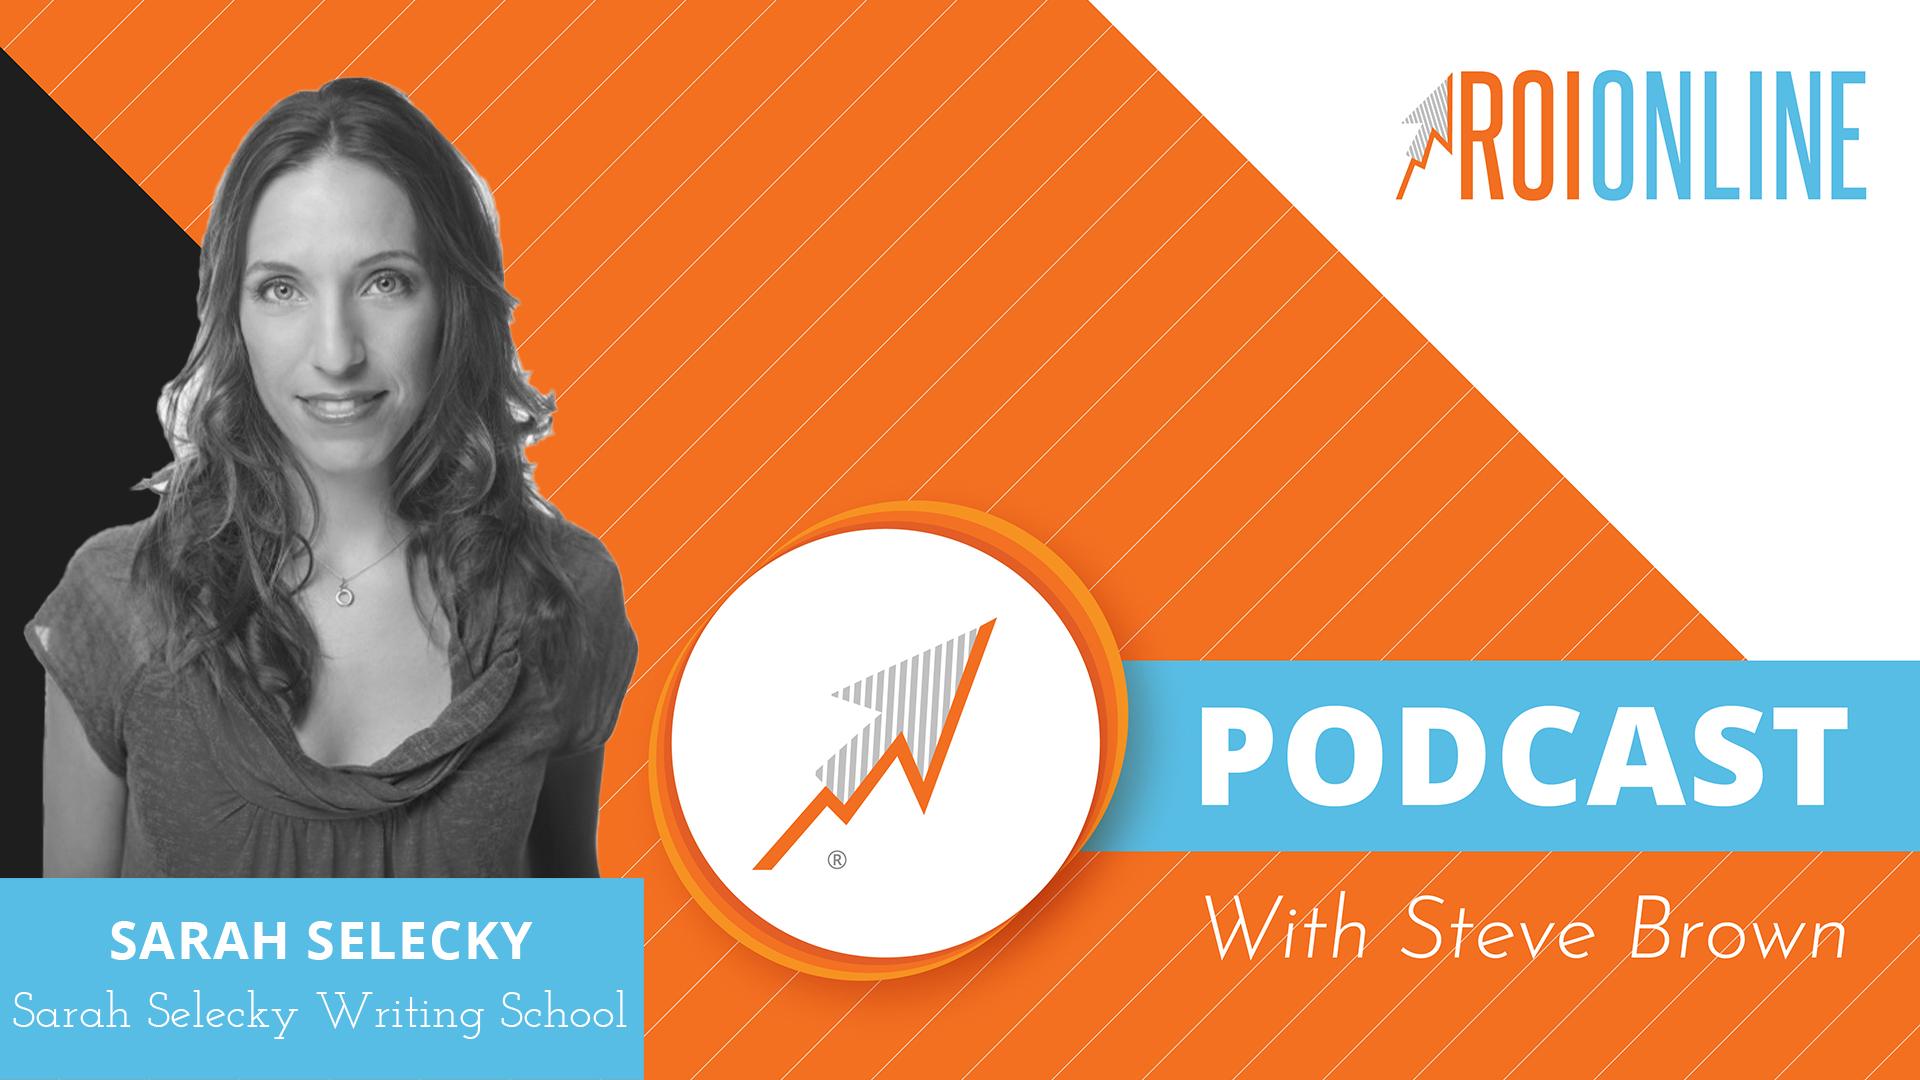 Sarah Selecky ROI Online podcast thumbnail